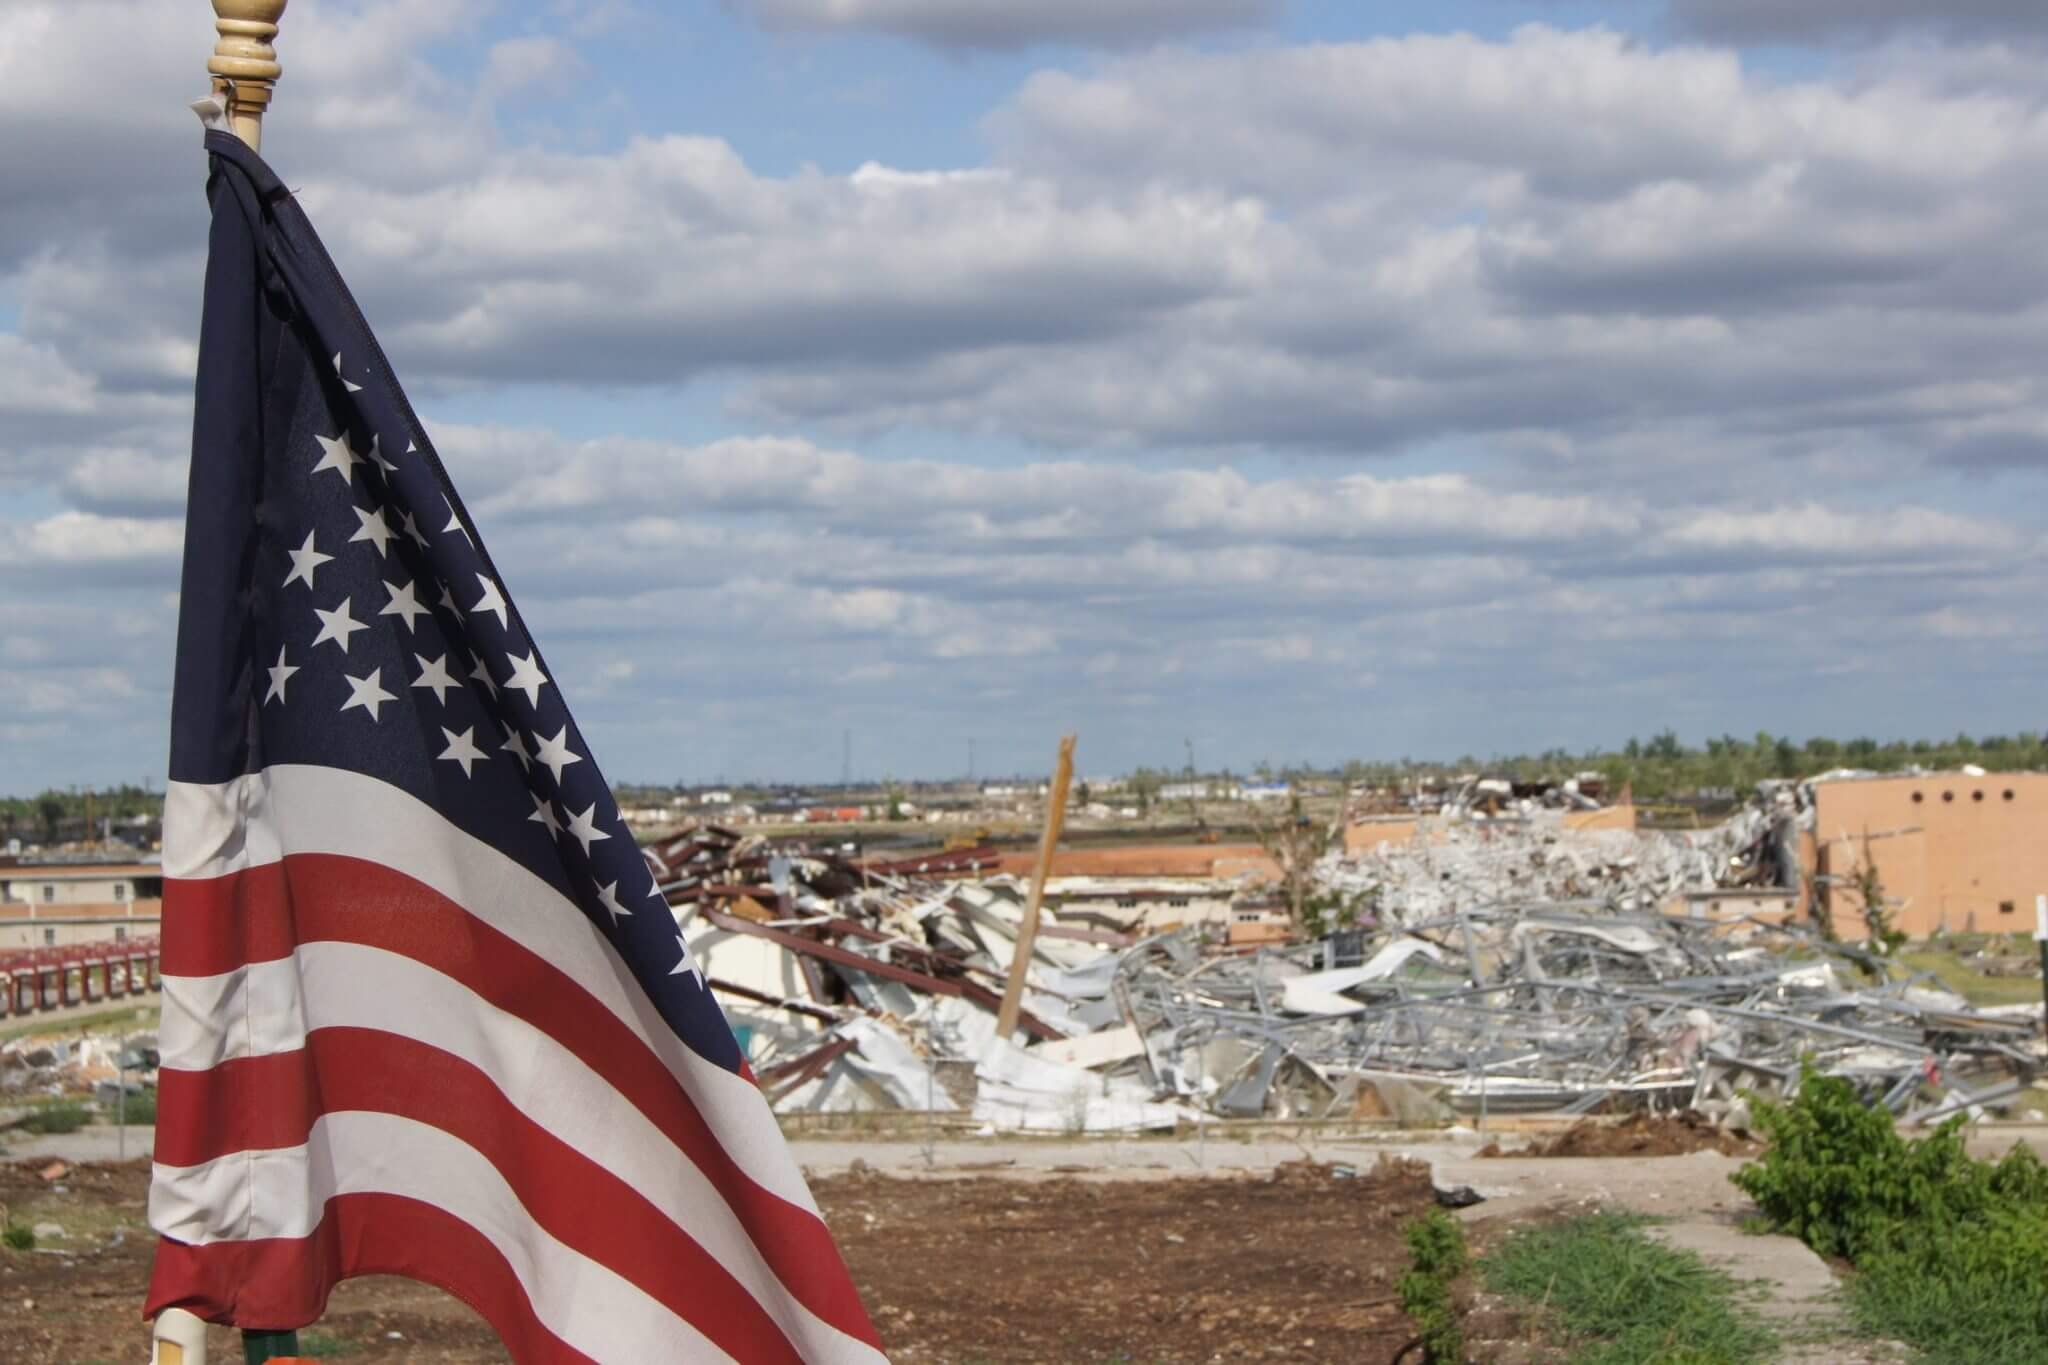 US National Flag and Debris 1